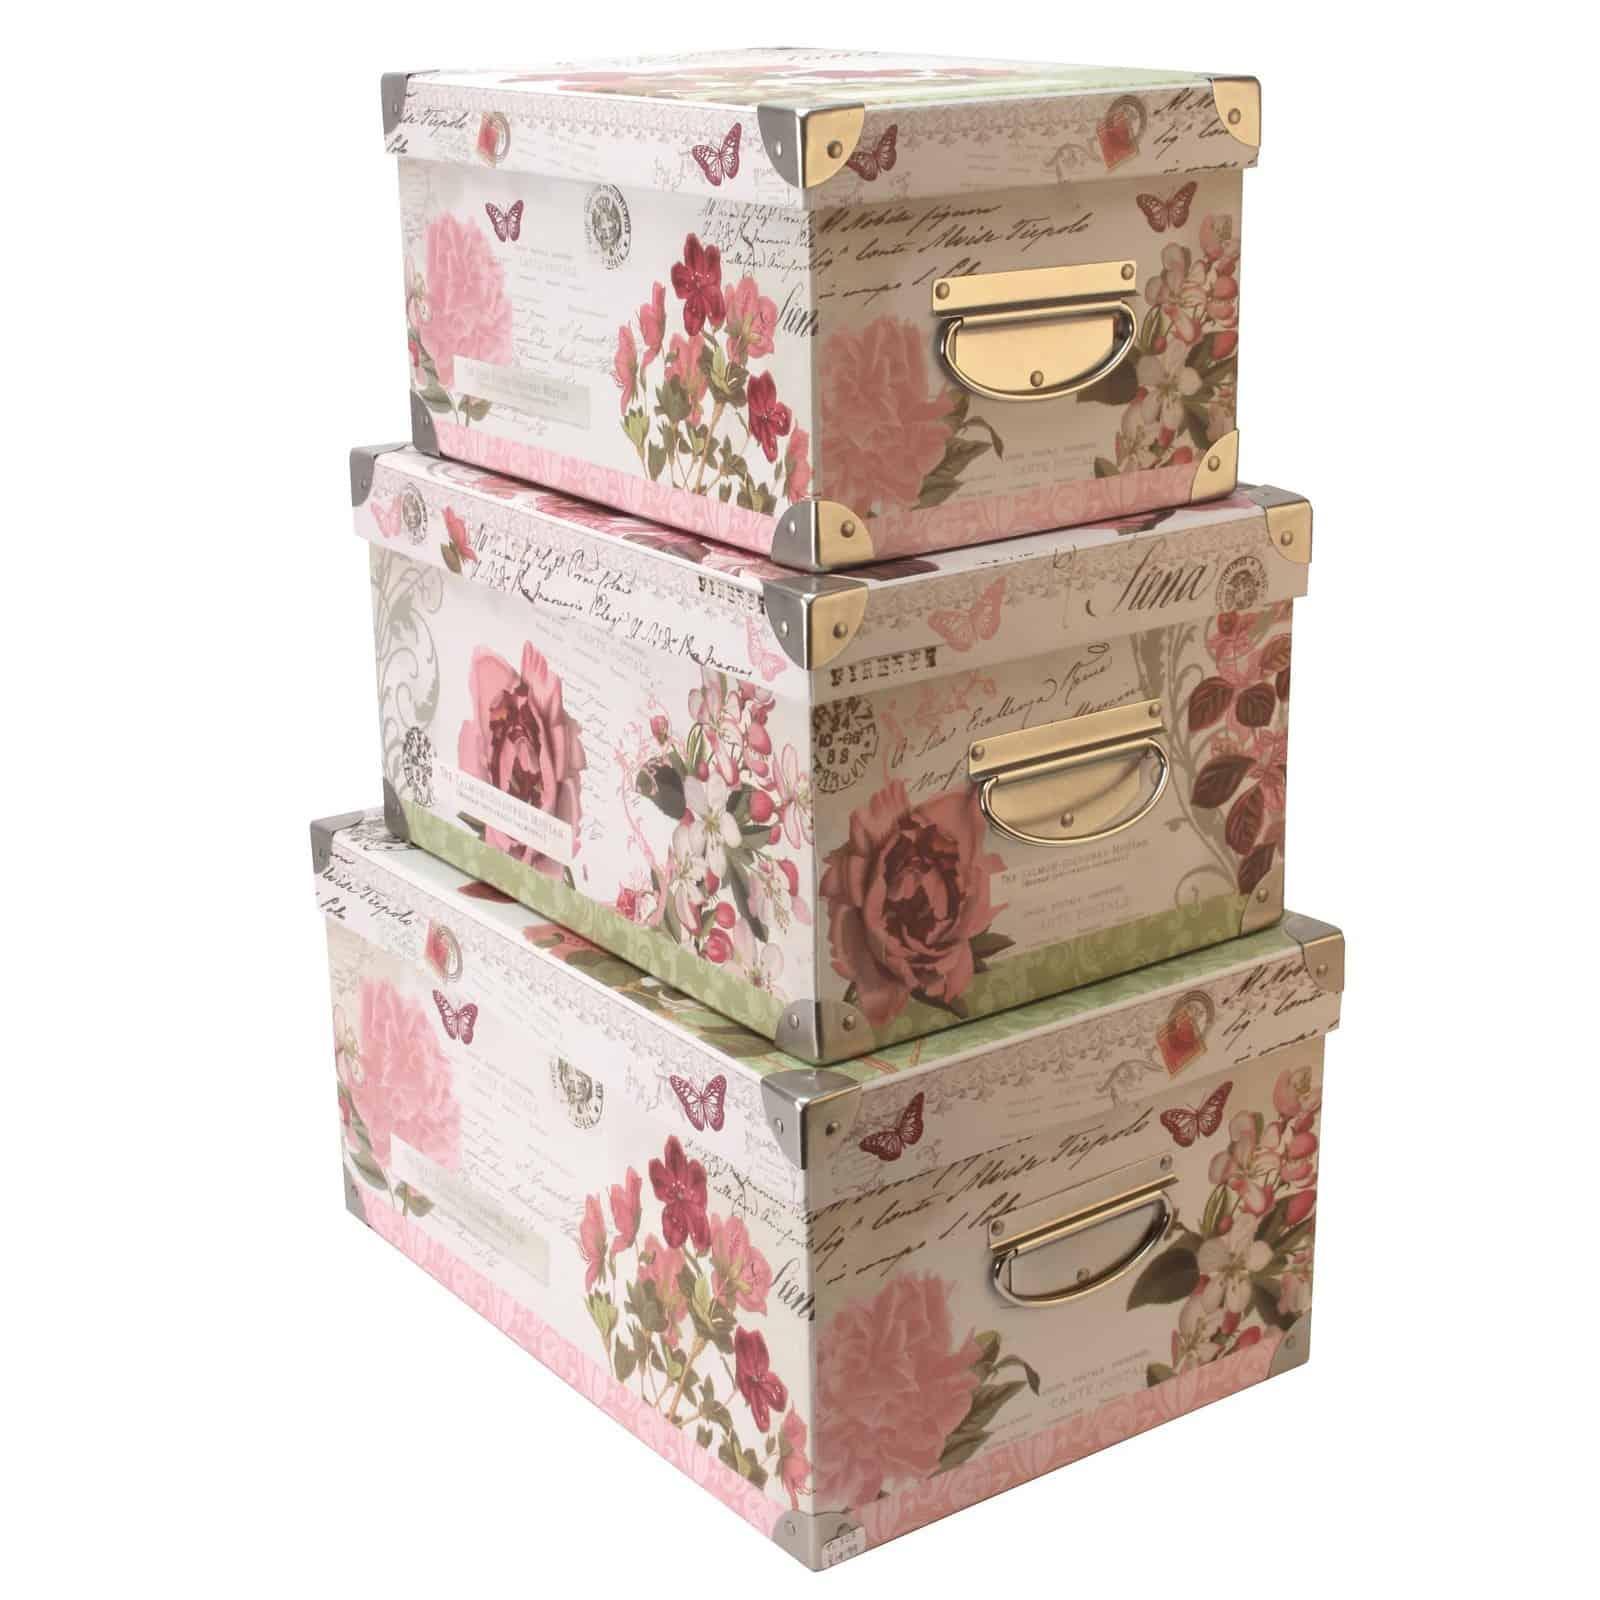 pretty-storage-boxes -set-of-three-primavera-trunk-design-tricoastal-designs-1170-p  sc 1 st  Mindful Mommy Doula & pretty-storage-boxes-set-of-three-primavera-trunk-design-tricoastal ...